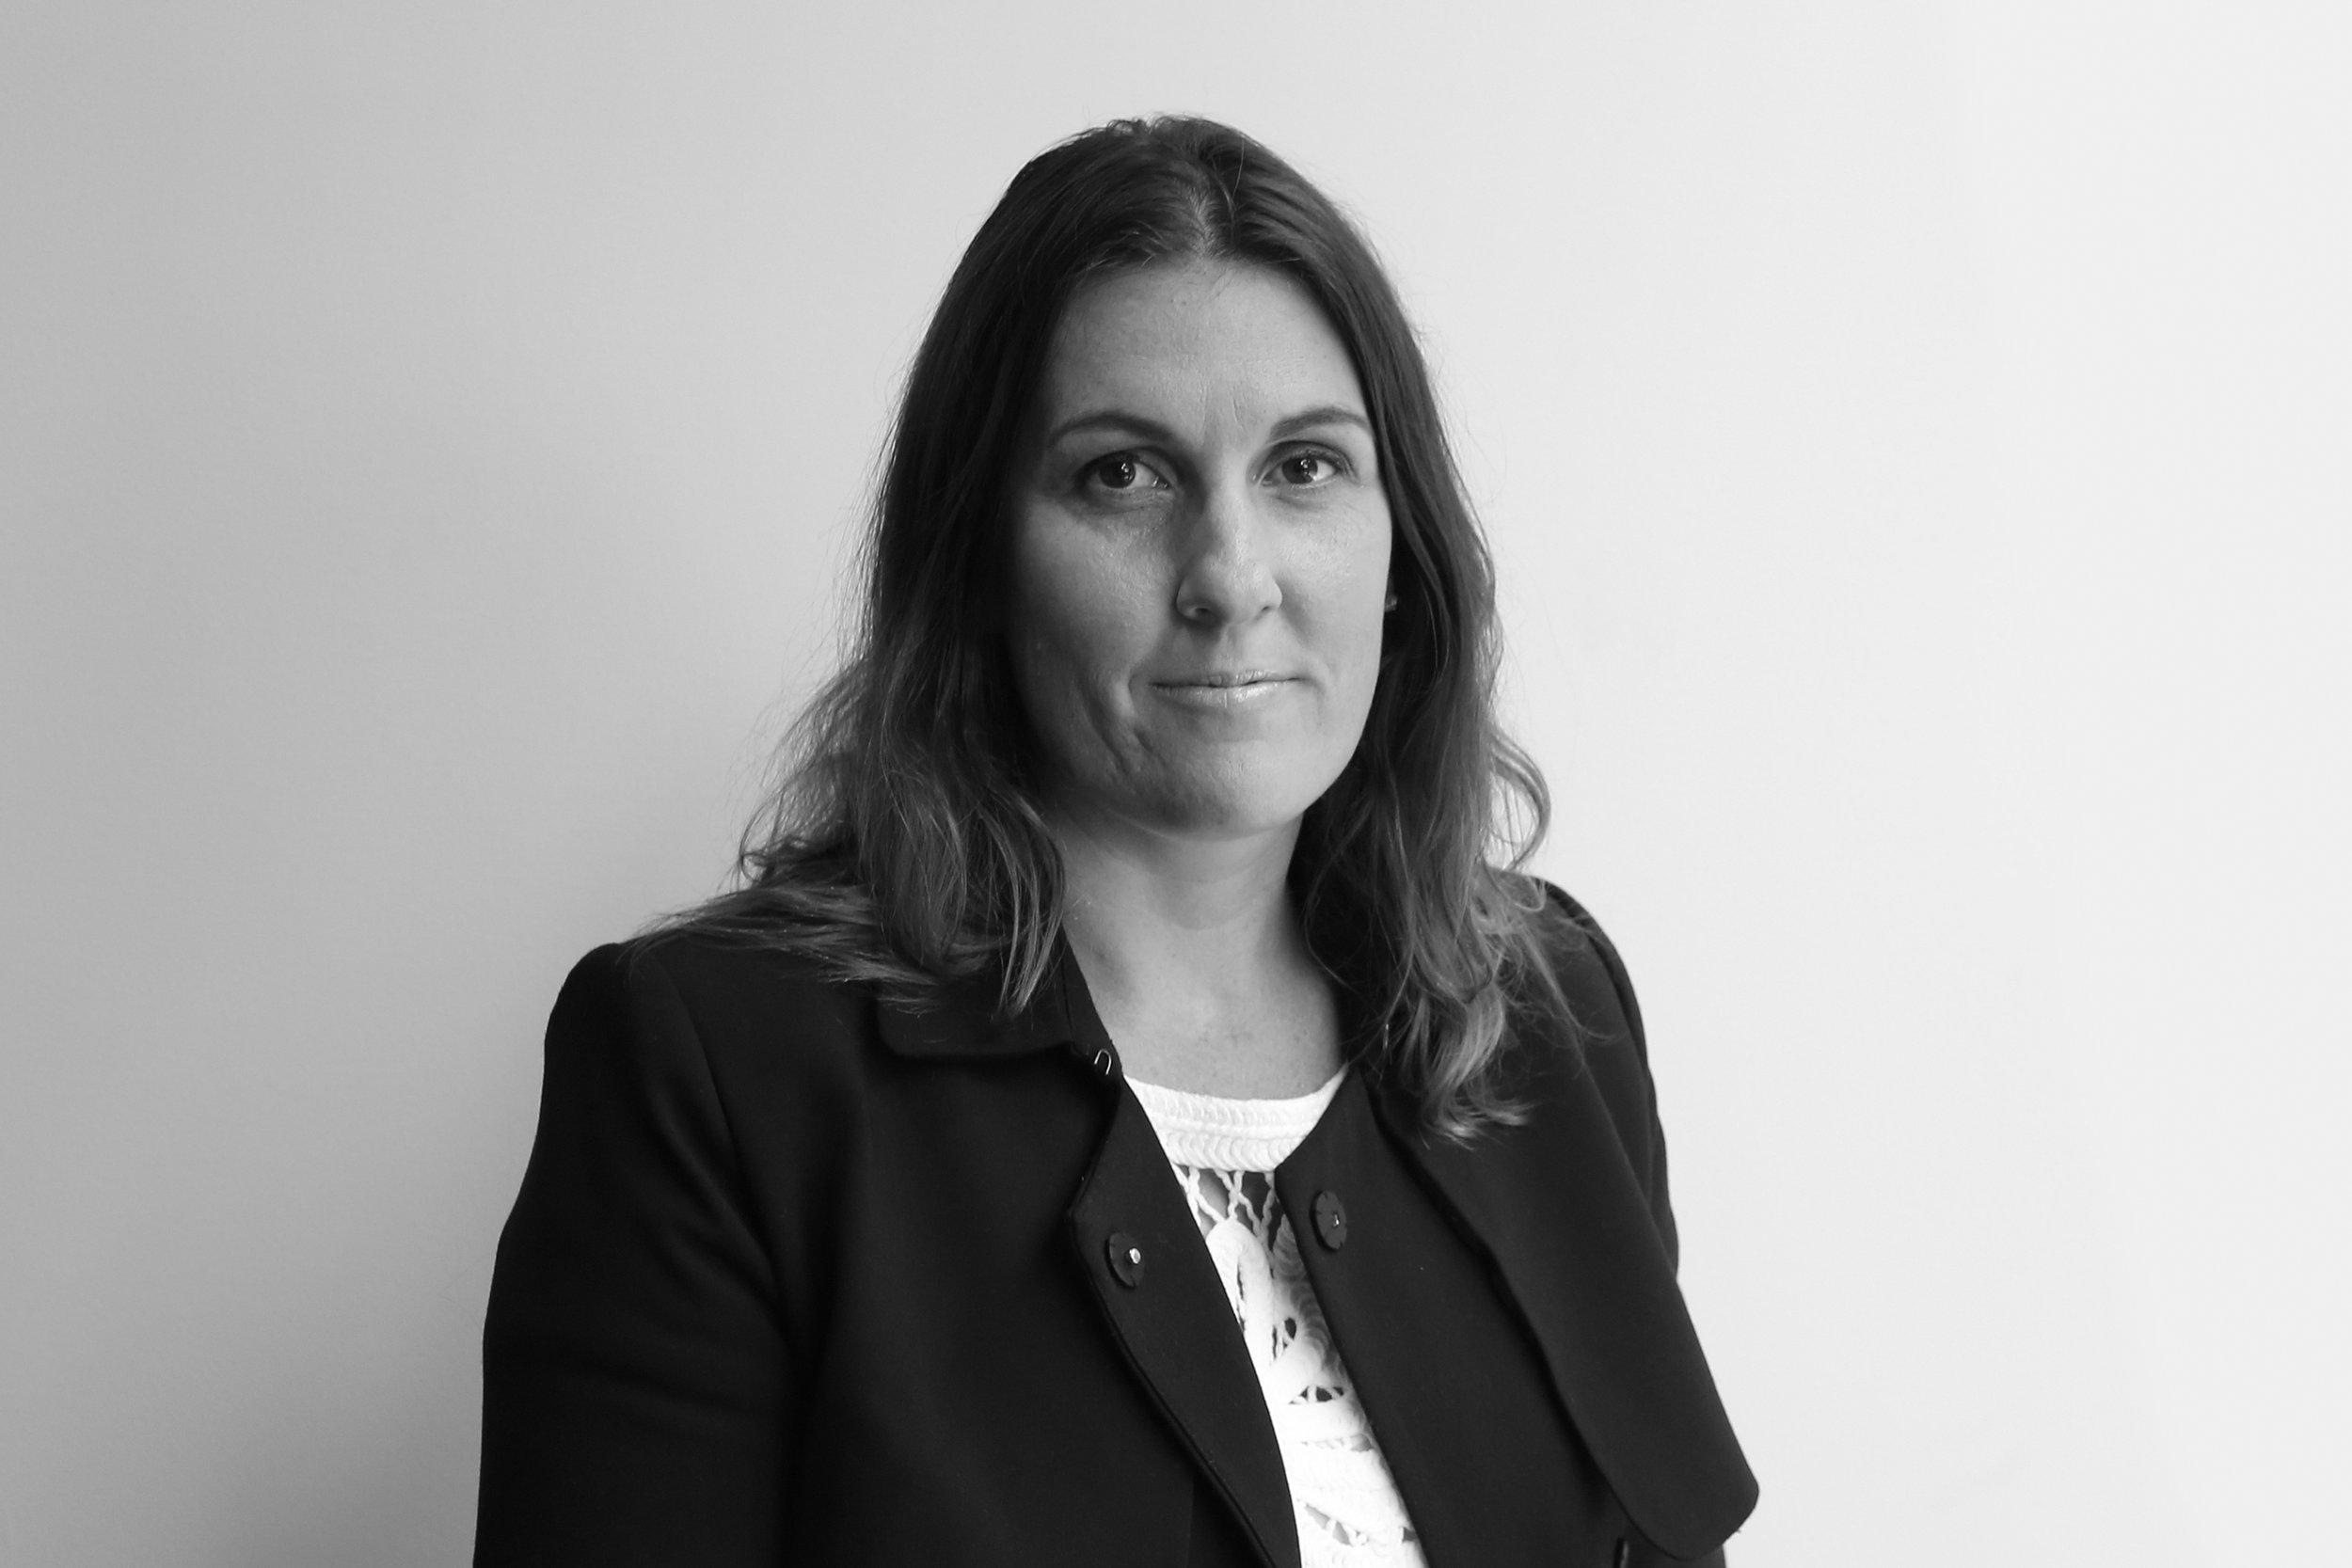 Megan Rodgers - Director